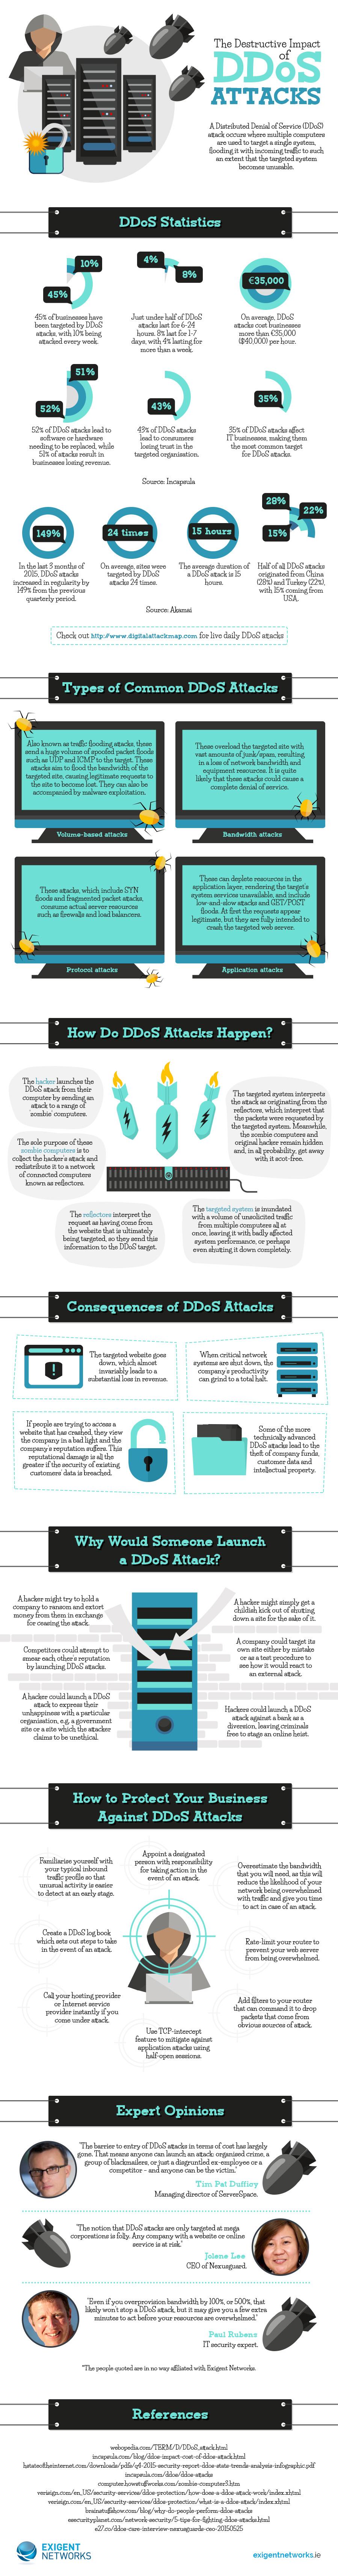 The-Destructive-Impact-of-DDoS-Attacks